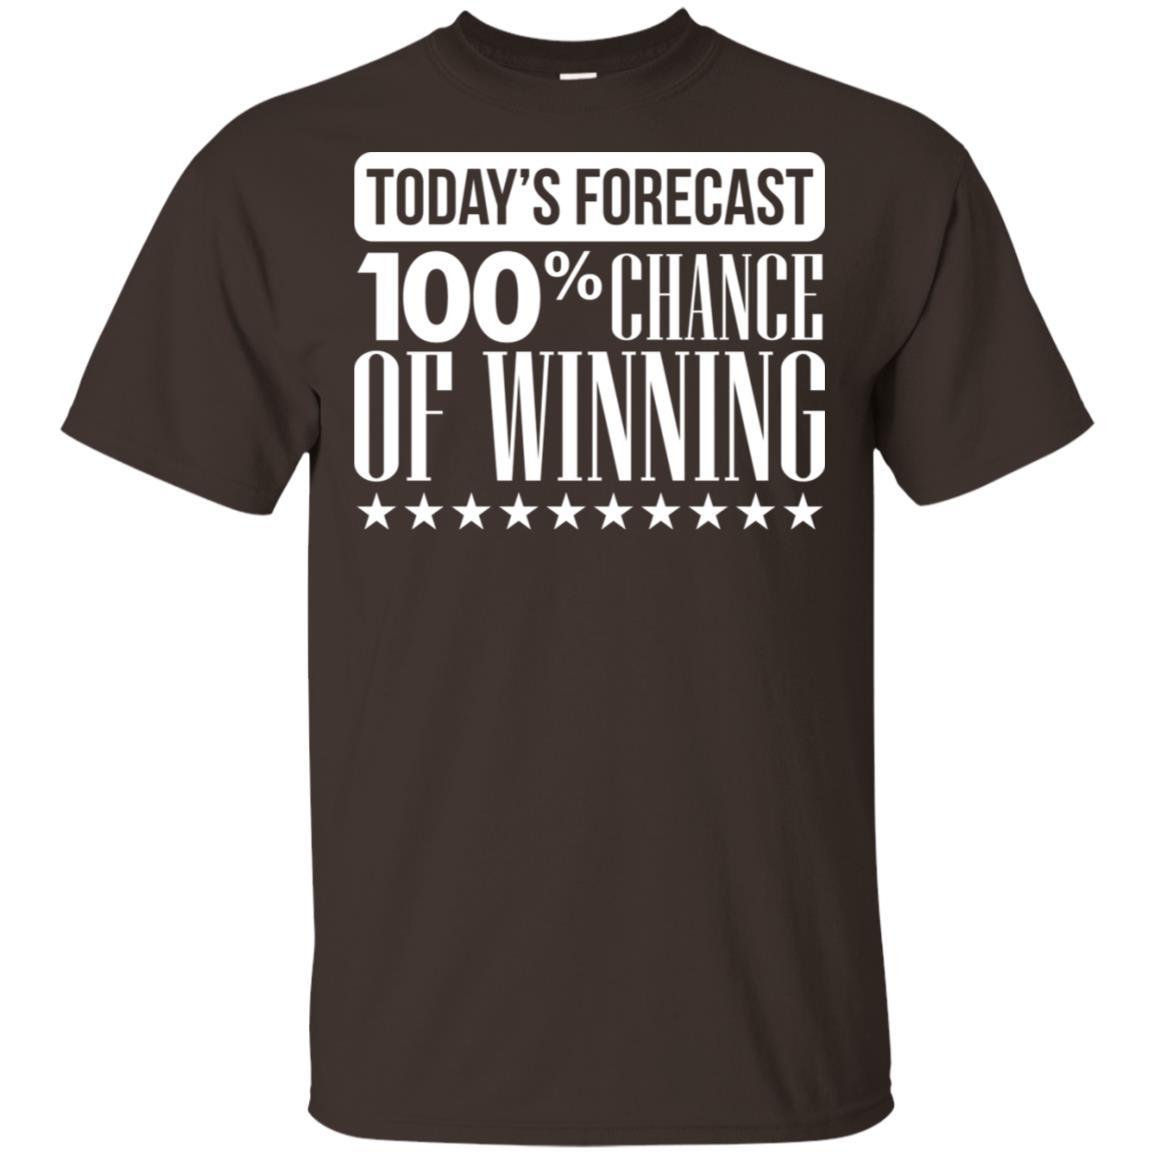 Forecast 100% Chance Of Winning Funny Sports Gift Ls-1 Unisex Short Sleeve